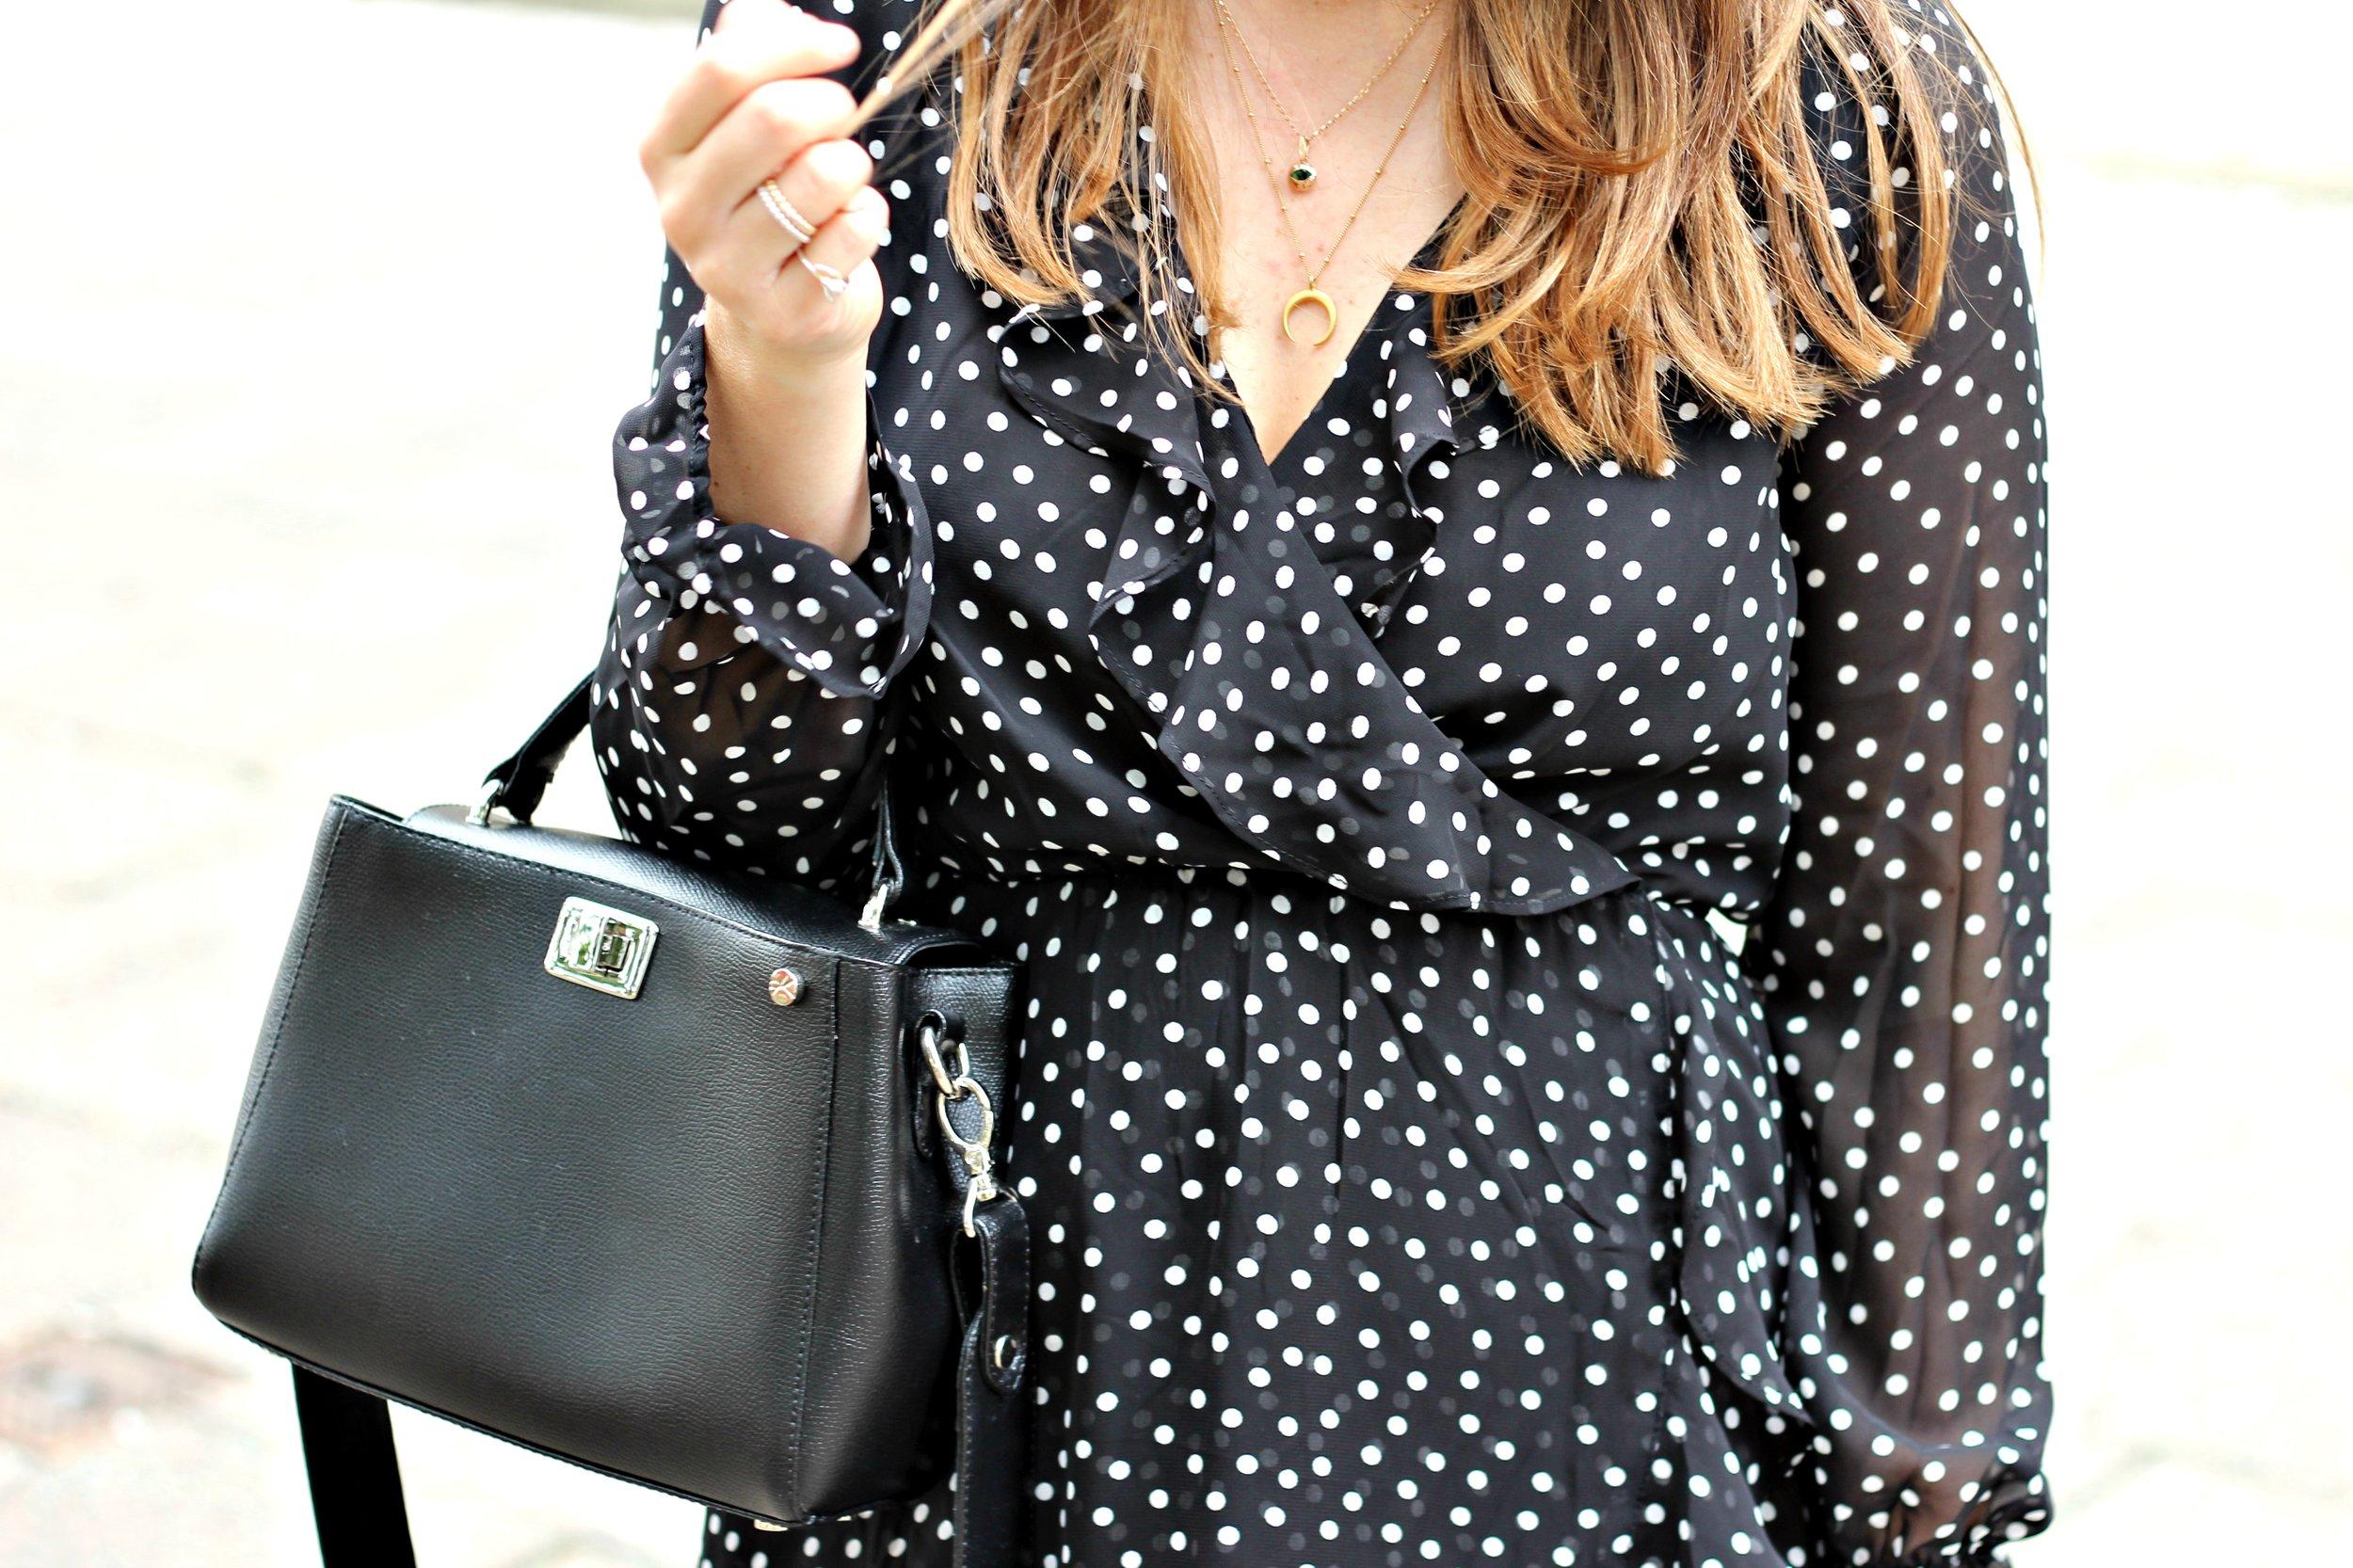 annaporter-wrap-dress-h&m-polka-dot-details